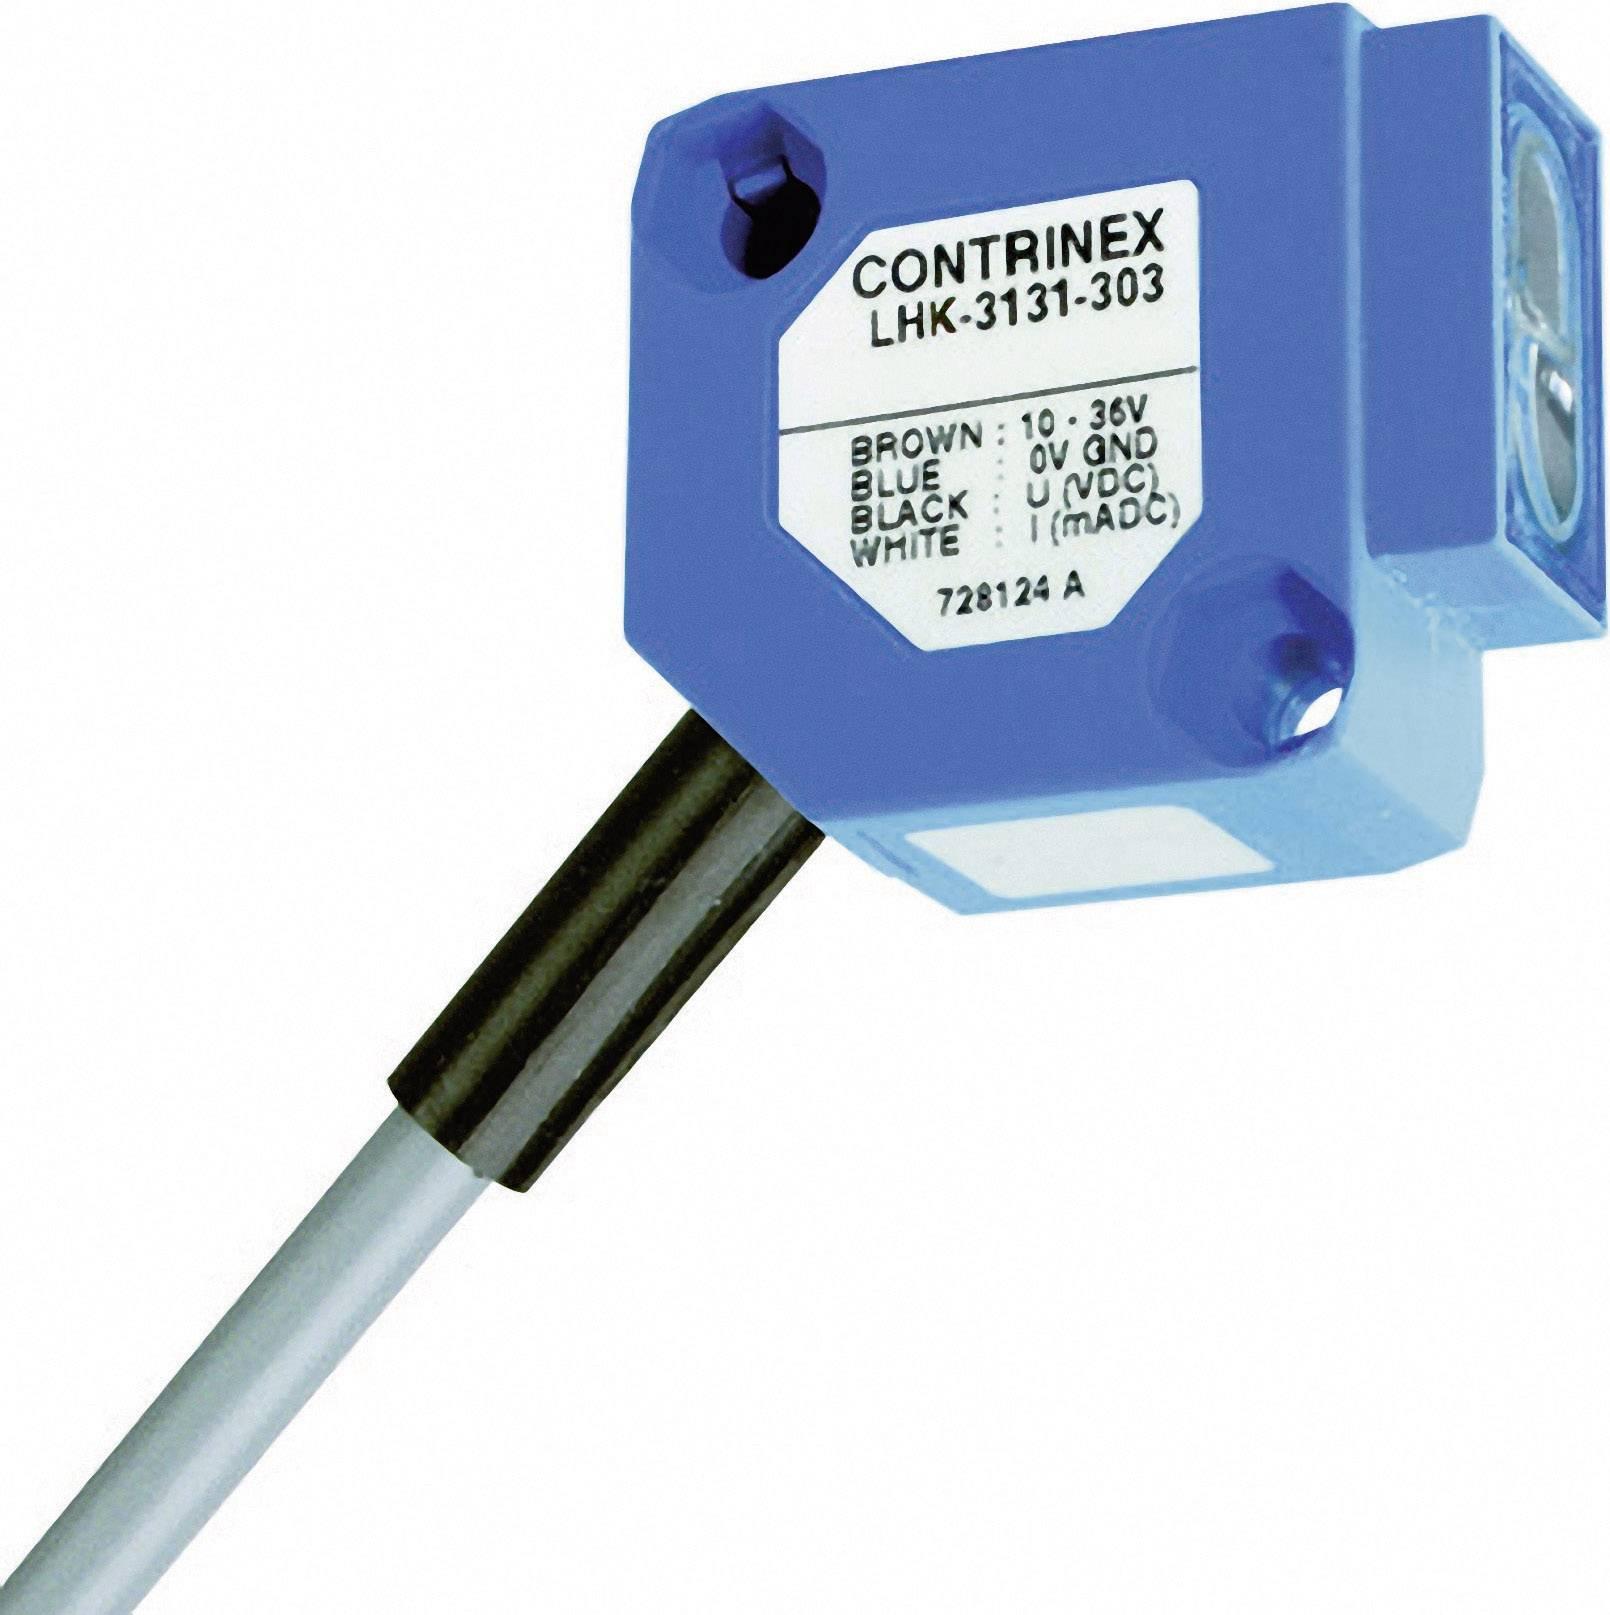 Reflexný optický snímač CONTRINEX LHK-3131-303 s HGA, dosah 15 - 200 mm, kábel 2 m